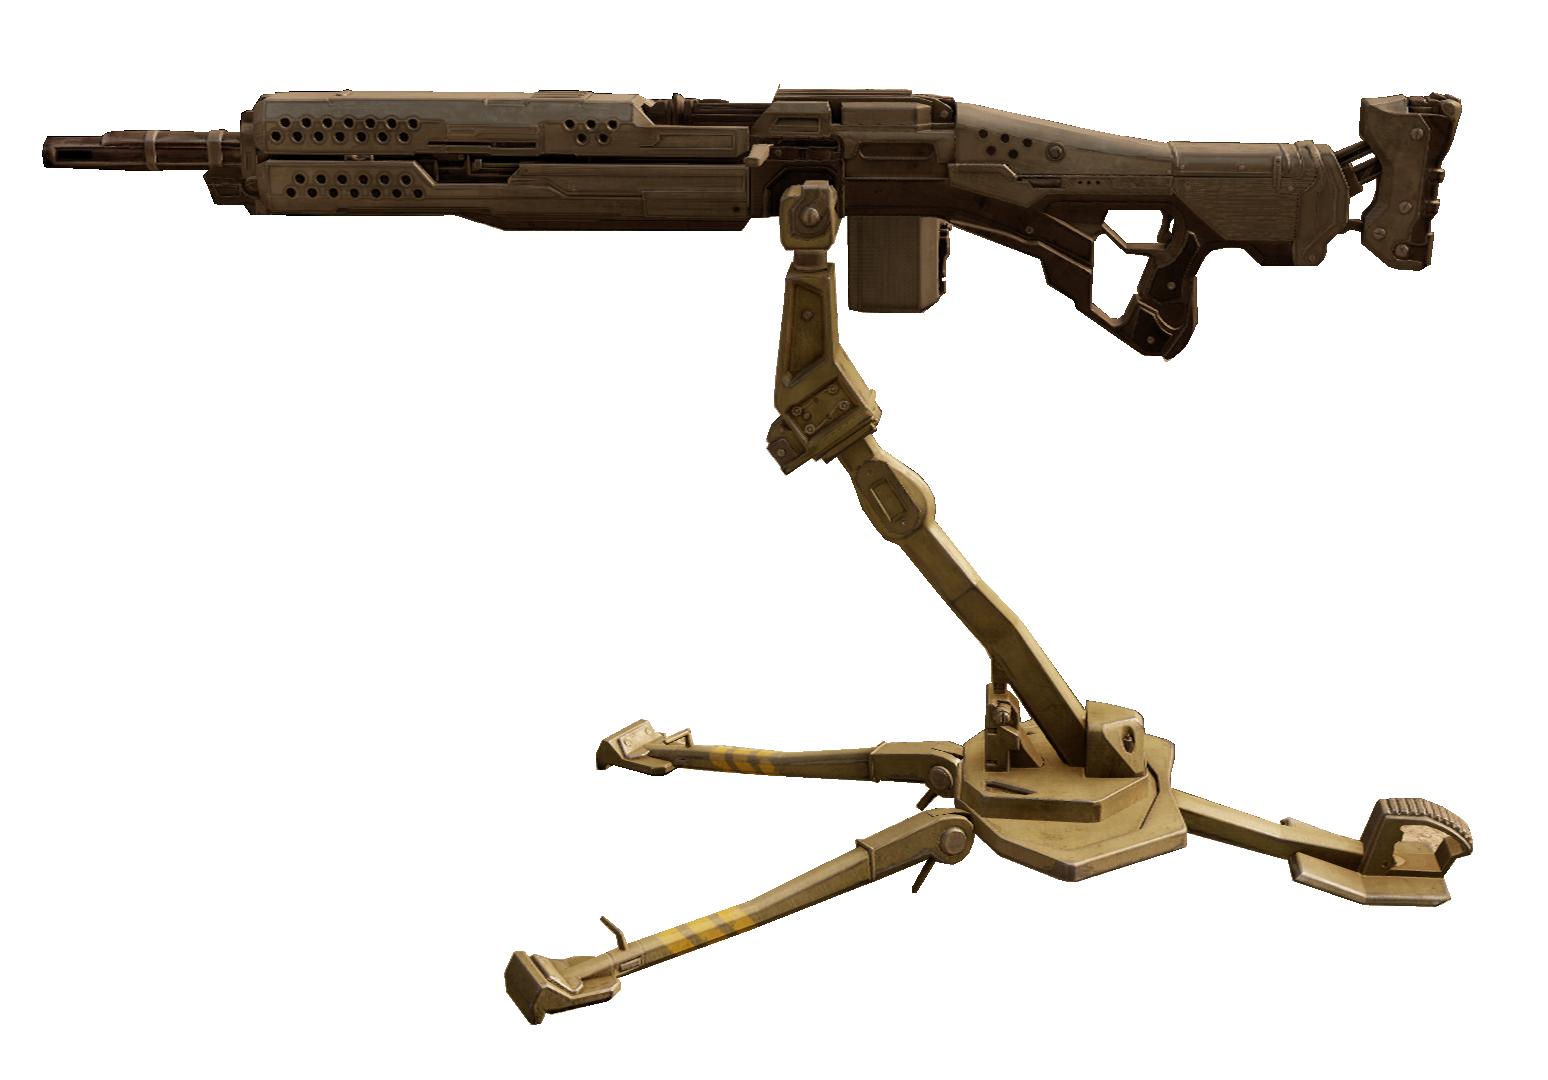 M247 General Purpose Machine Gun